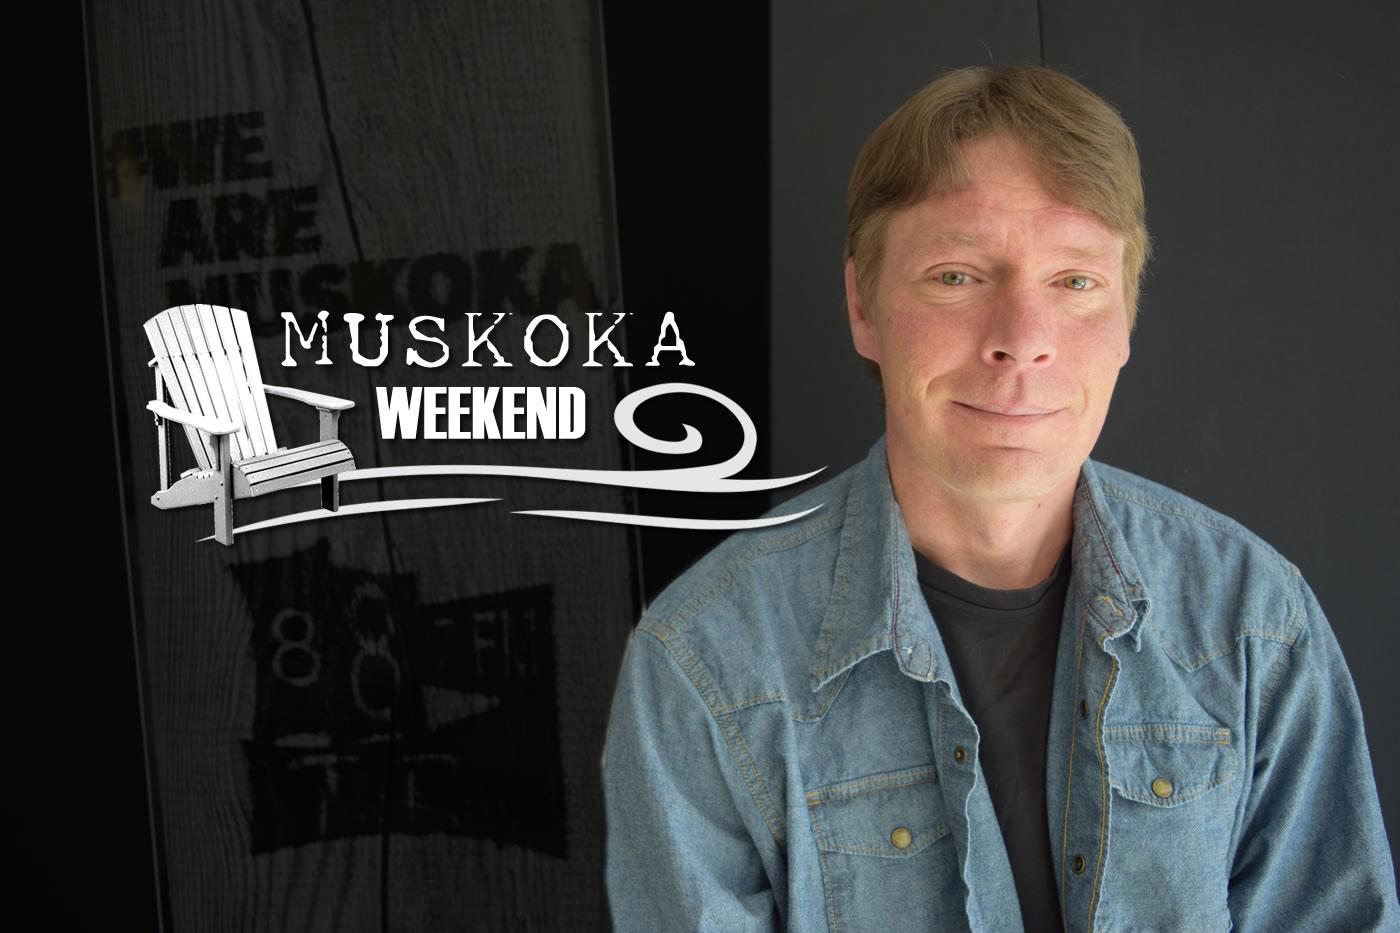 Muskoka Weekend